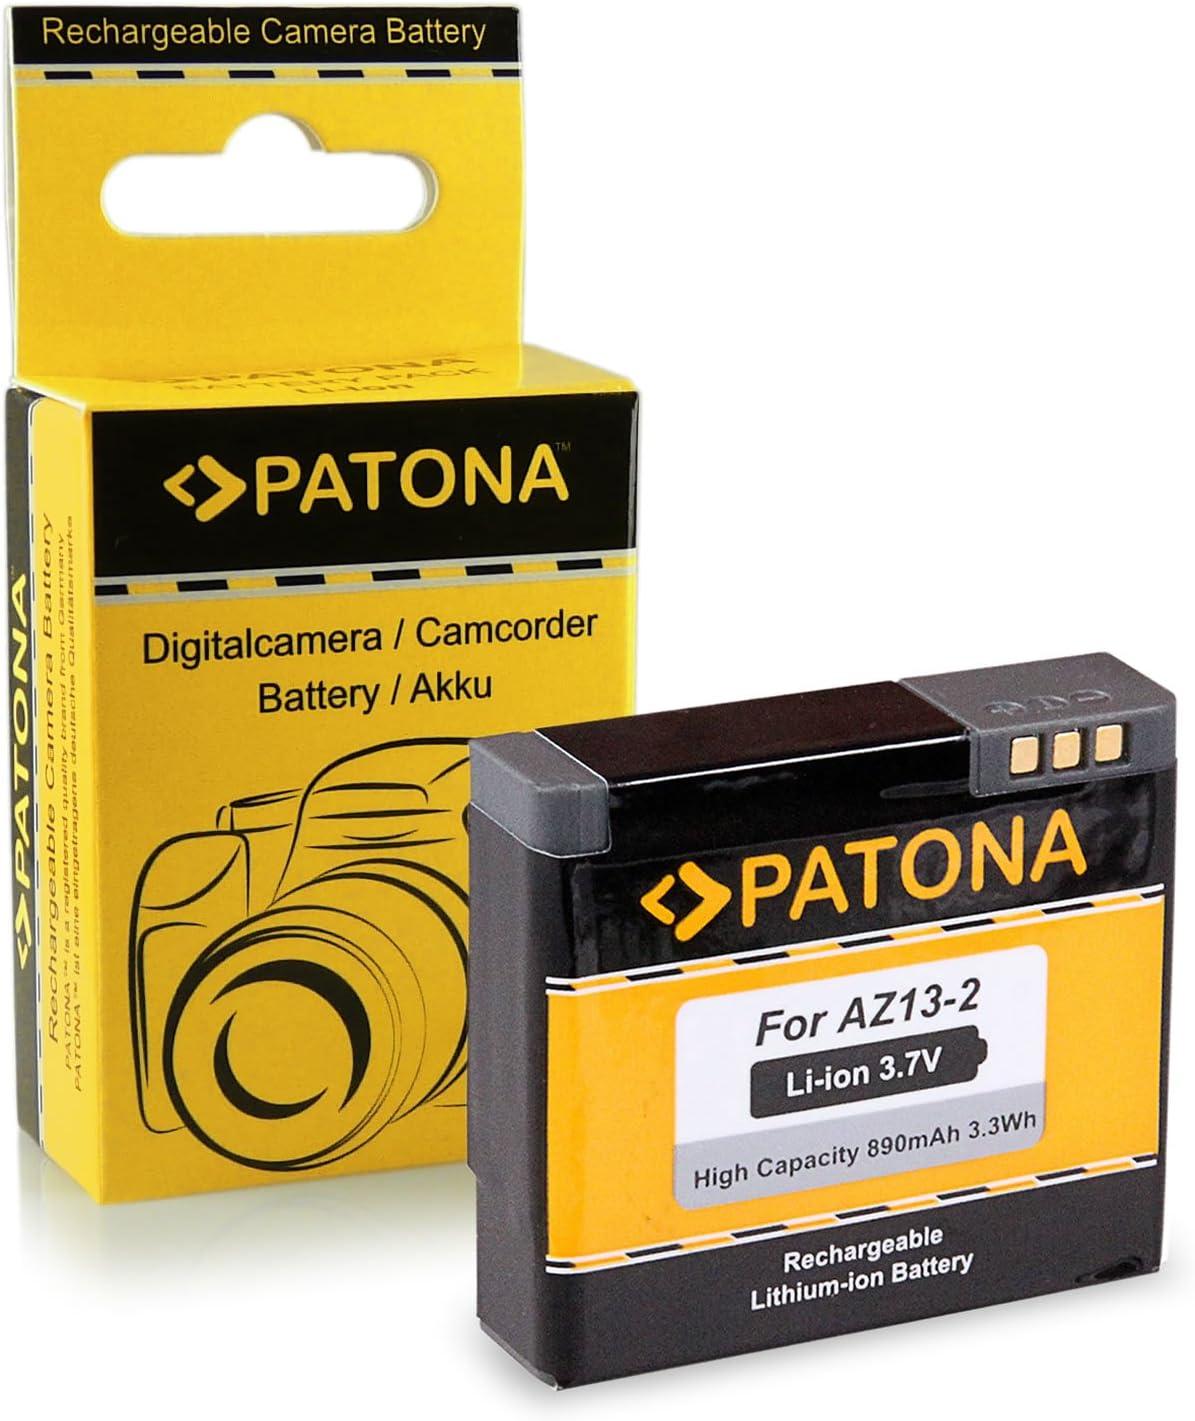 PATONA Bateria AZ13-2 Compatible con Xiaomi Yi Xiaoyi YDXJO1XY, de Calidad Probada y fiable